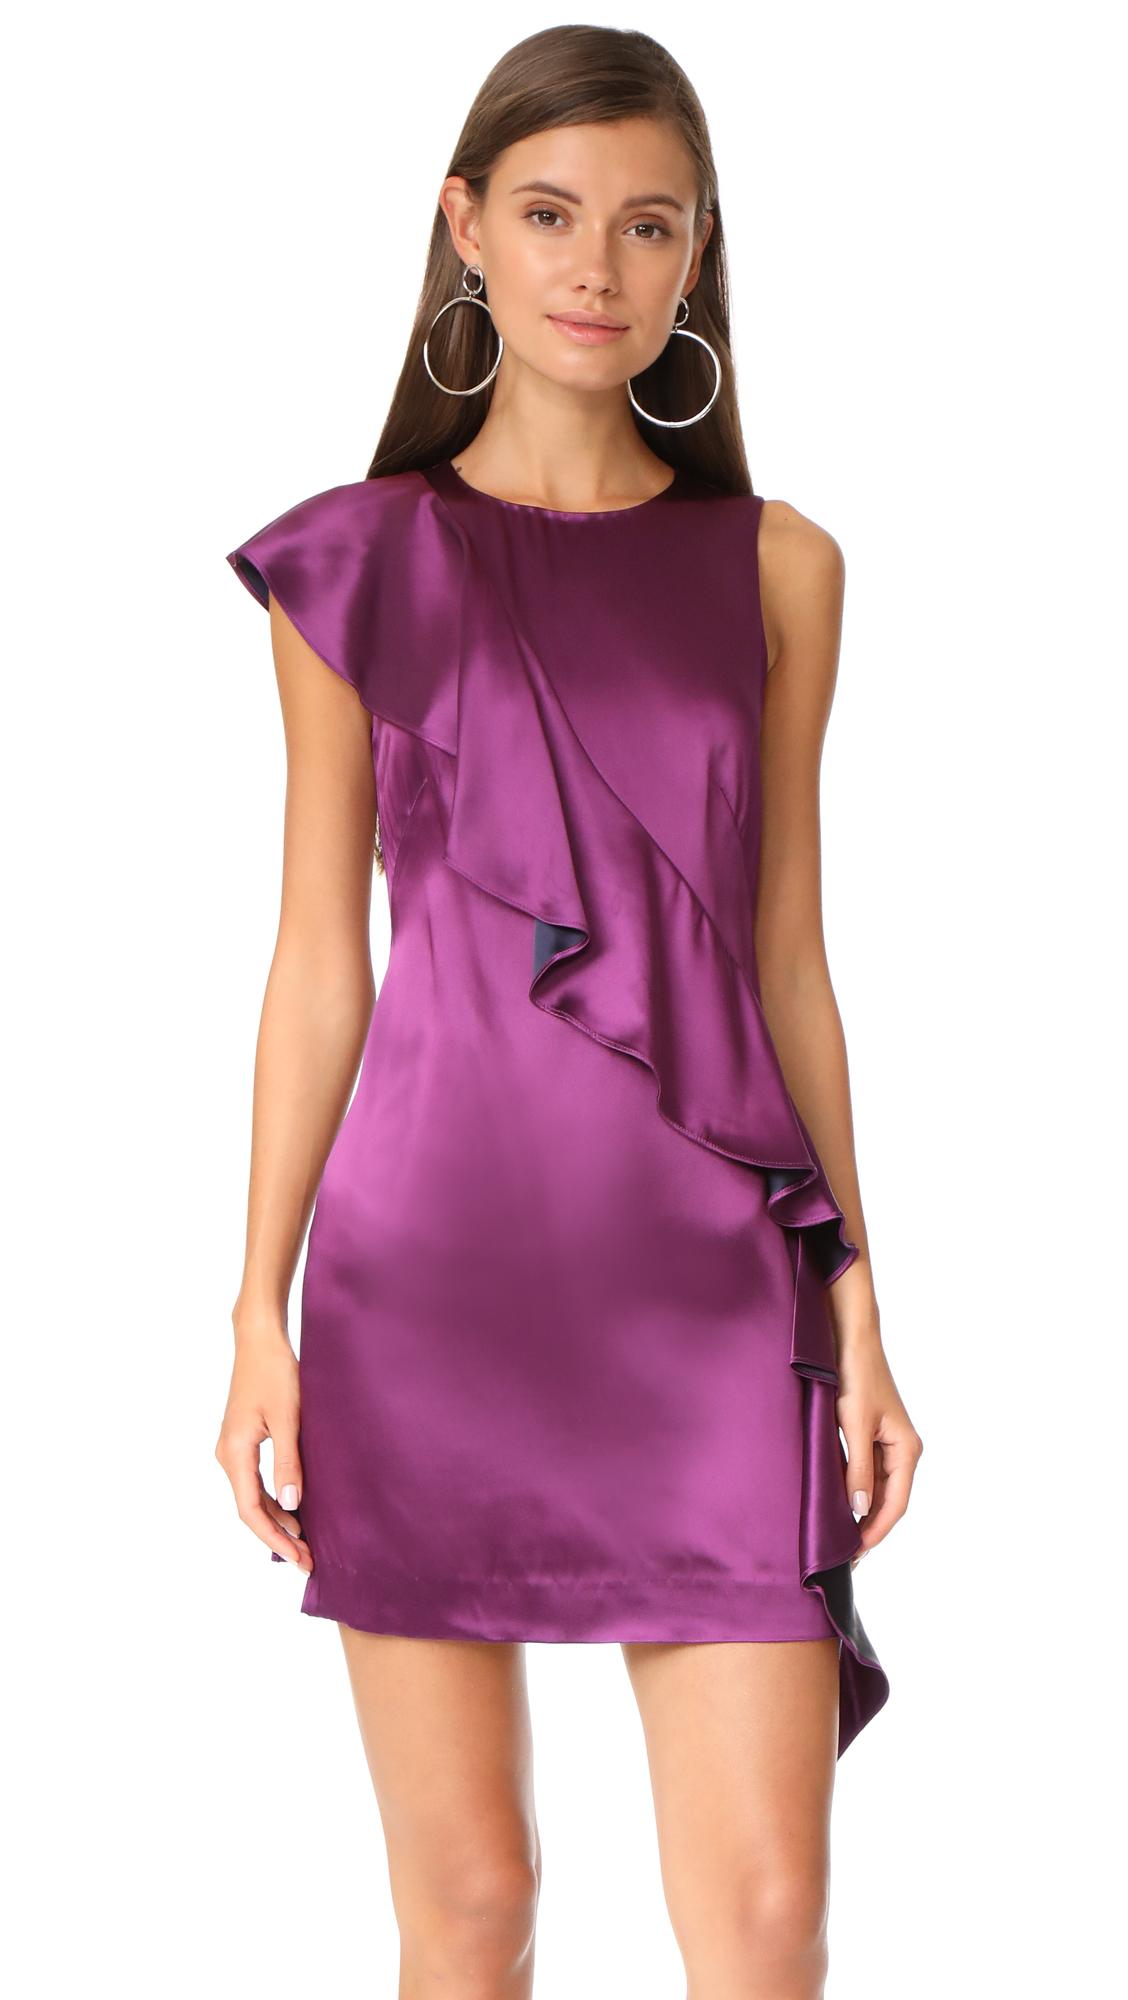 Diane von Furstenberg Sleeveless Cross Body Ruffle Dress - Aubergine/Midnight